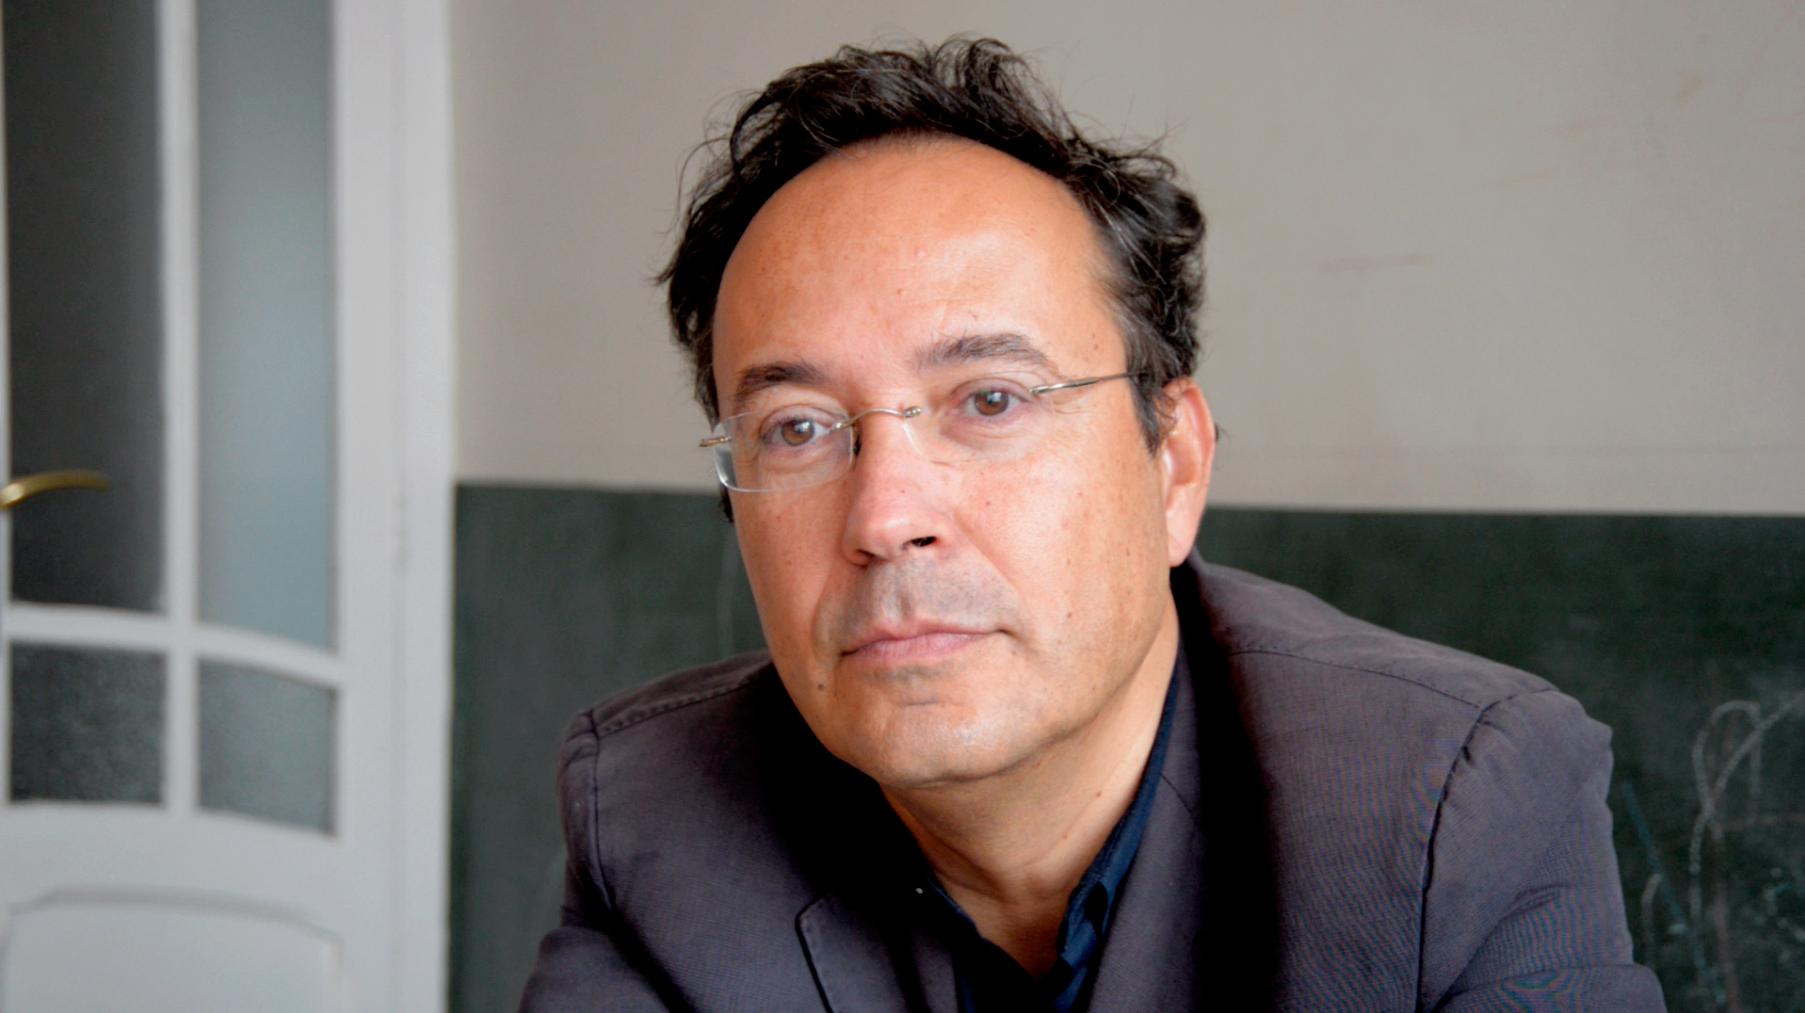 Nostàlgia de l'embriaguesa: filosofia [Juan Arnau a #Avivament2018] | VP-2018-15